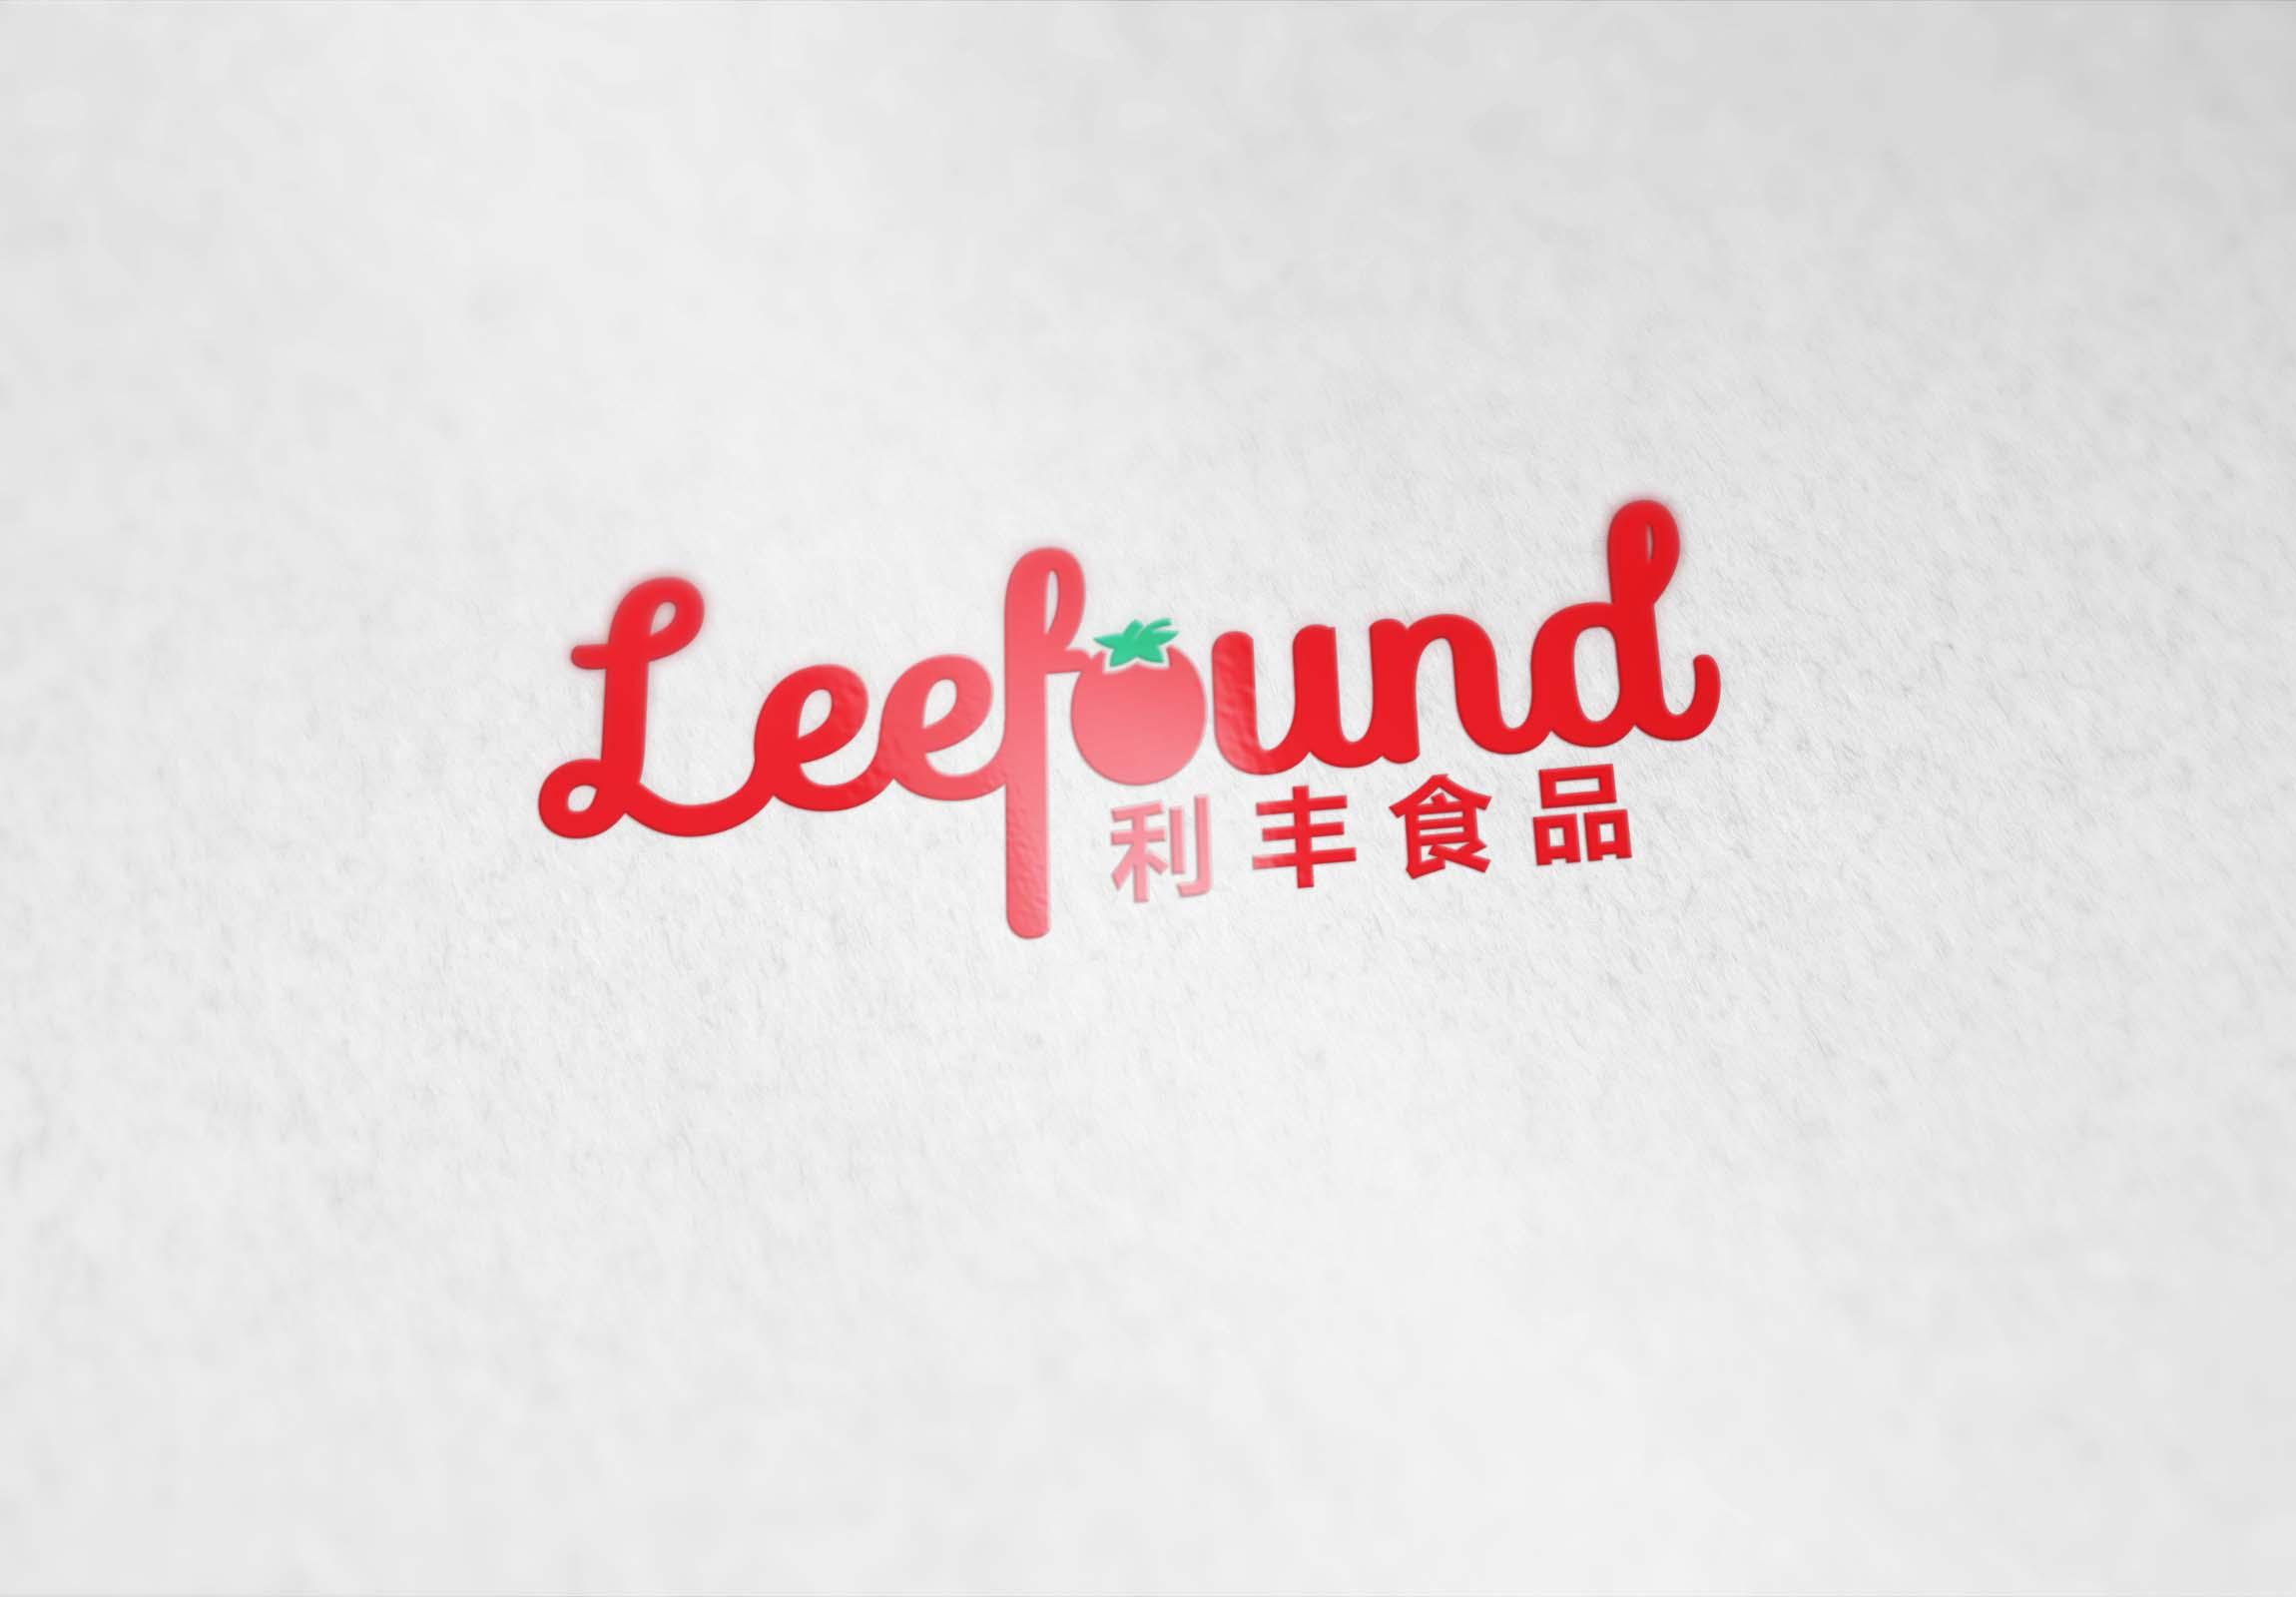 LEEFOUND公司LOGO设计_2958930_k68威客网